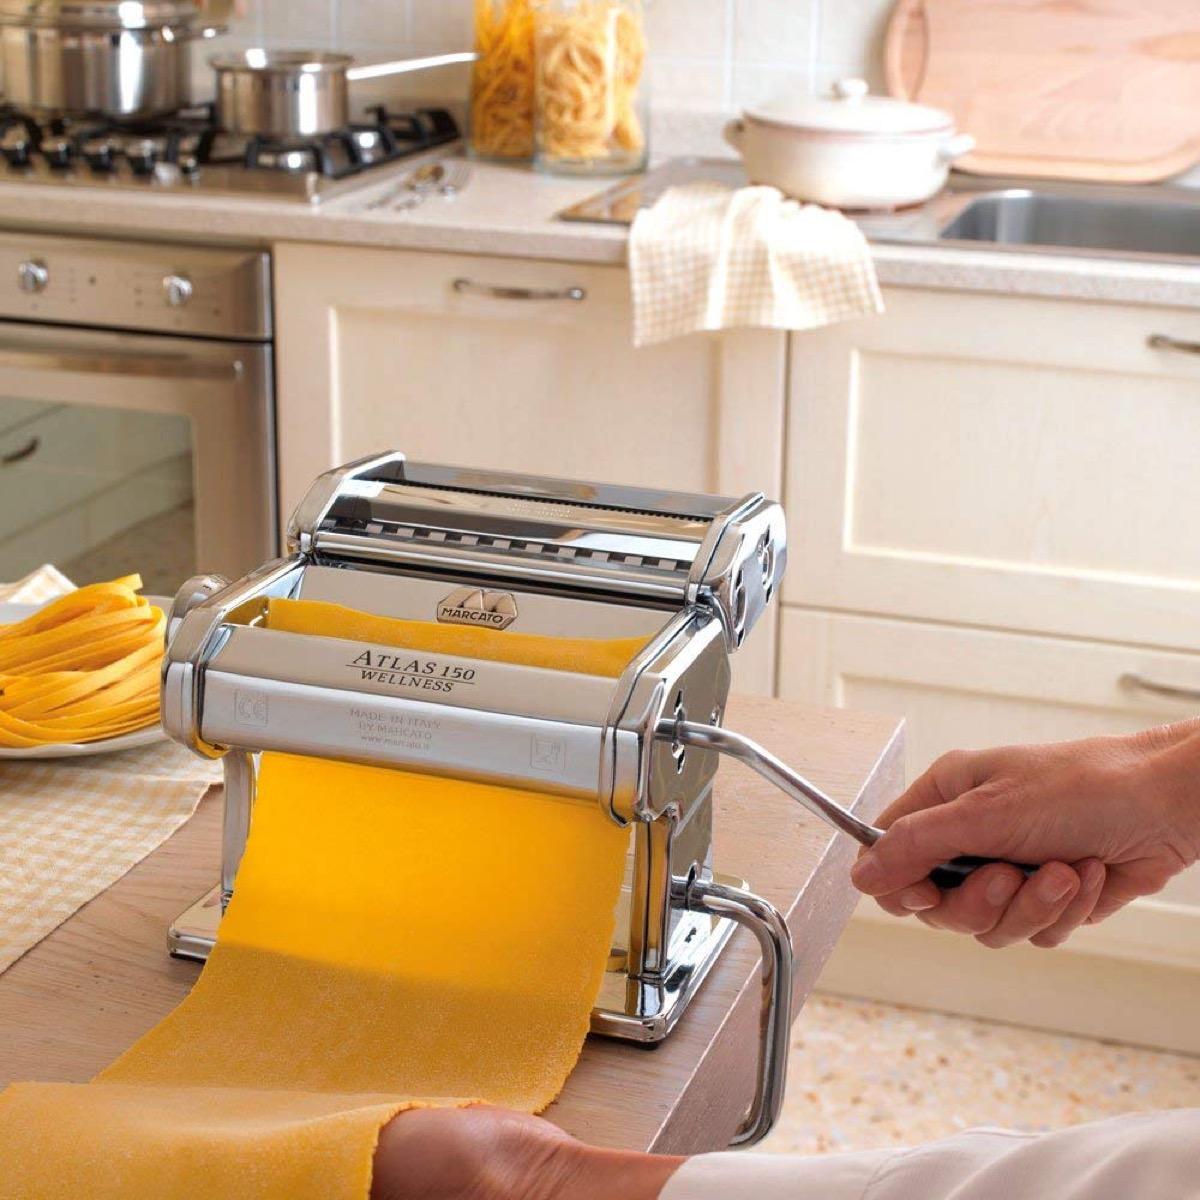 marcato atlas pasta machine from amazon, best boyfriend gifts